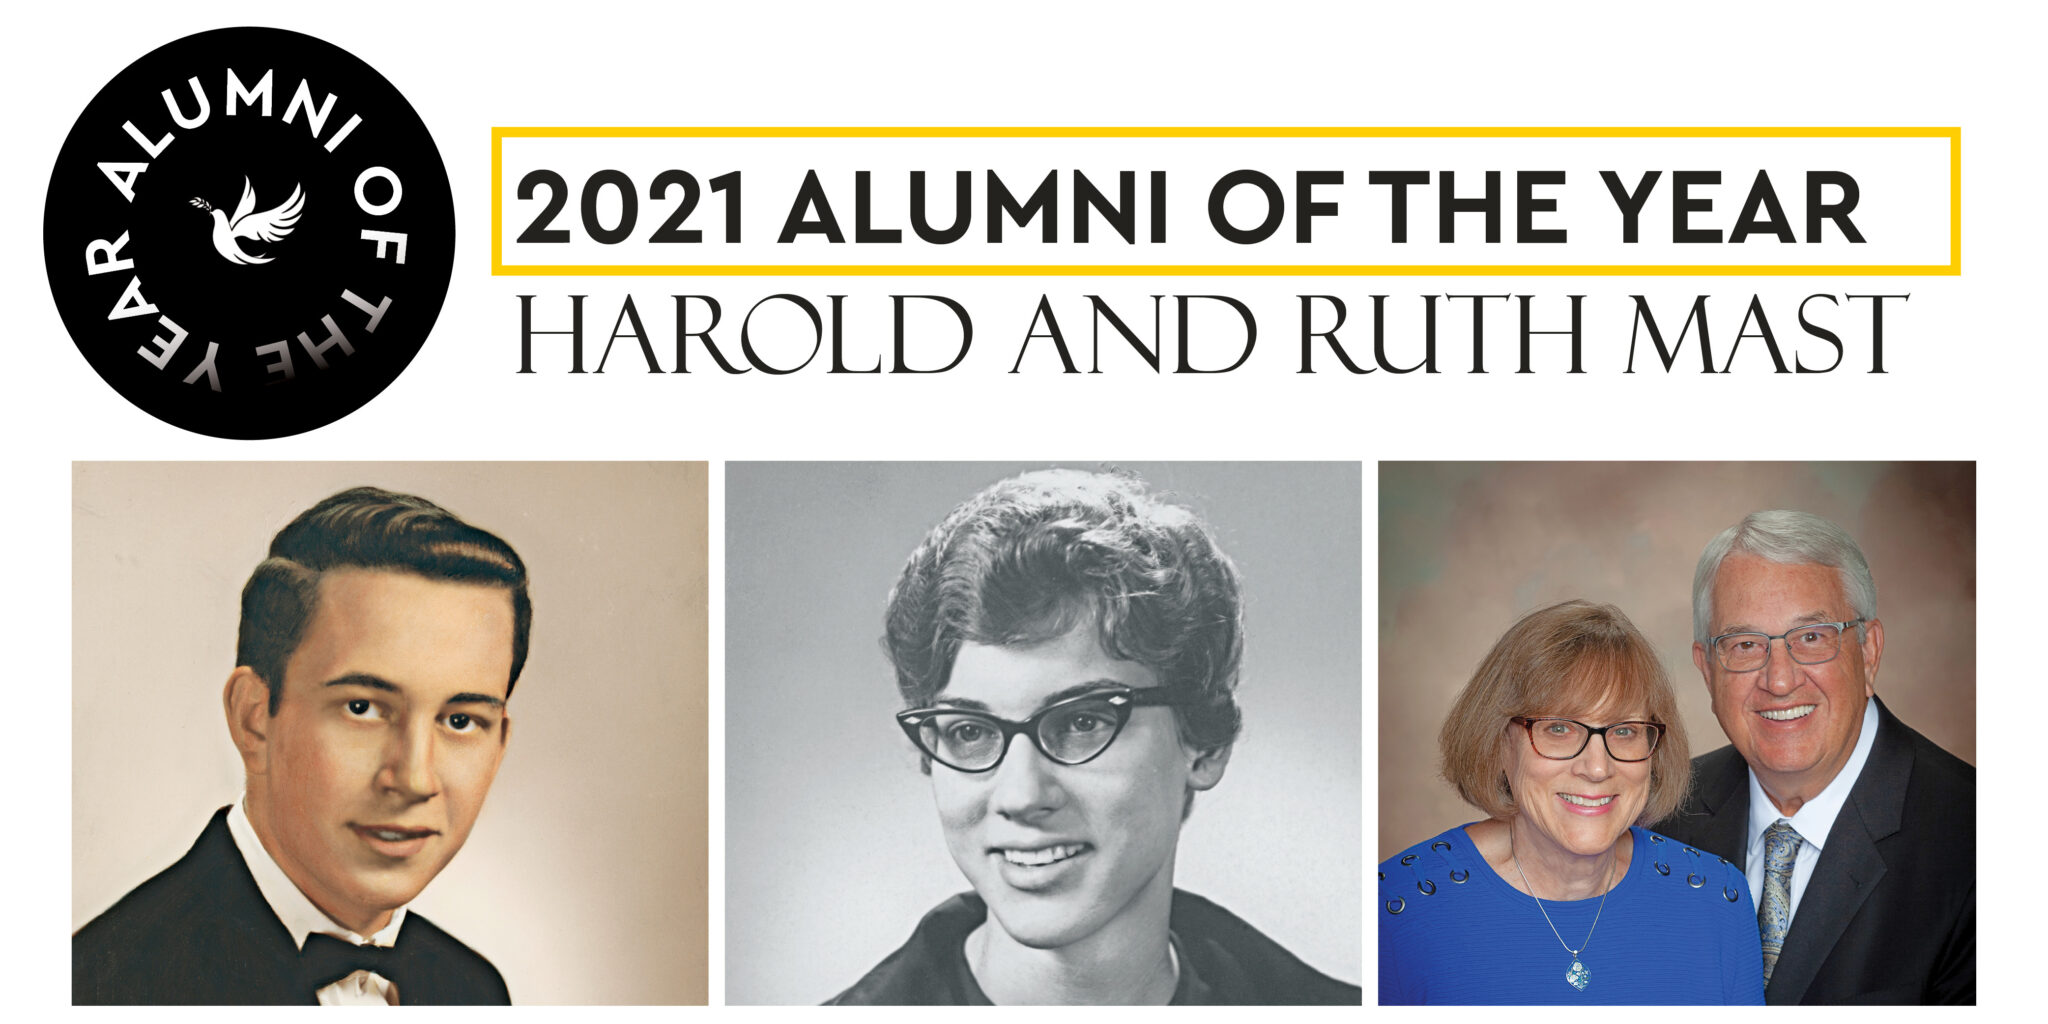 ruth & harold mast alumni of the year